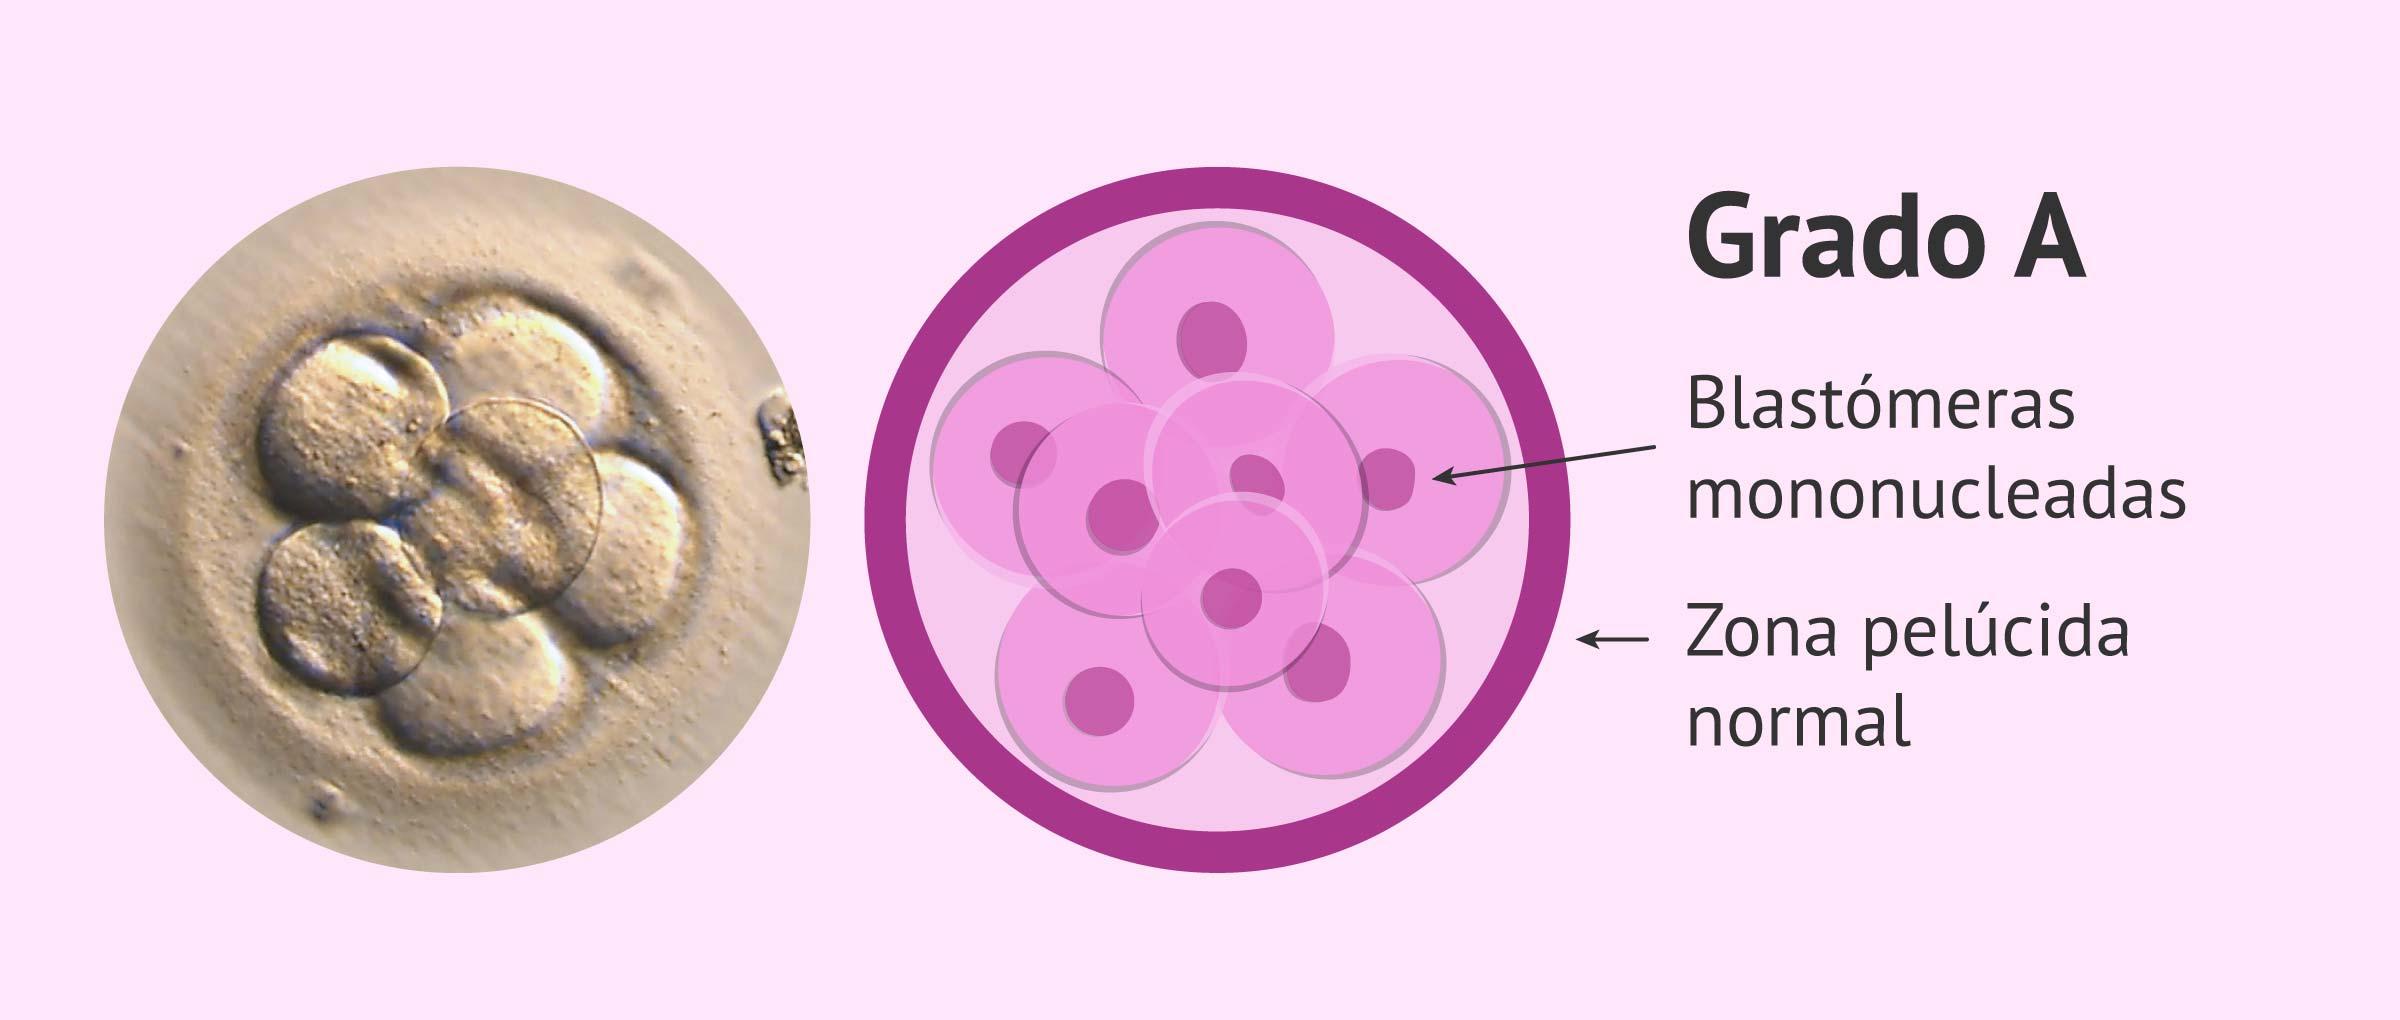 Calidad embrionaria